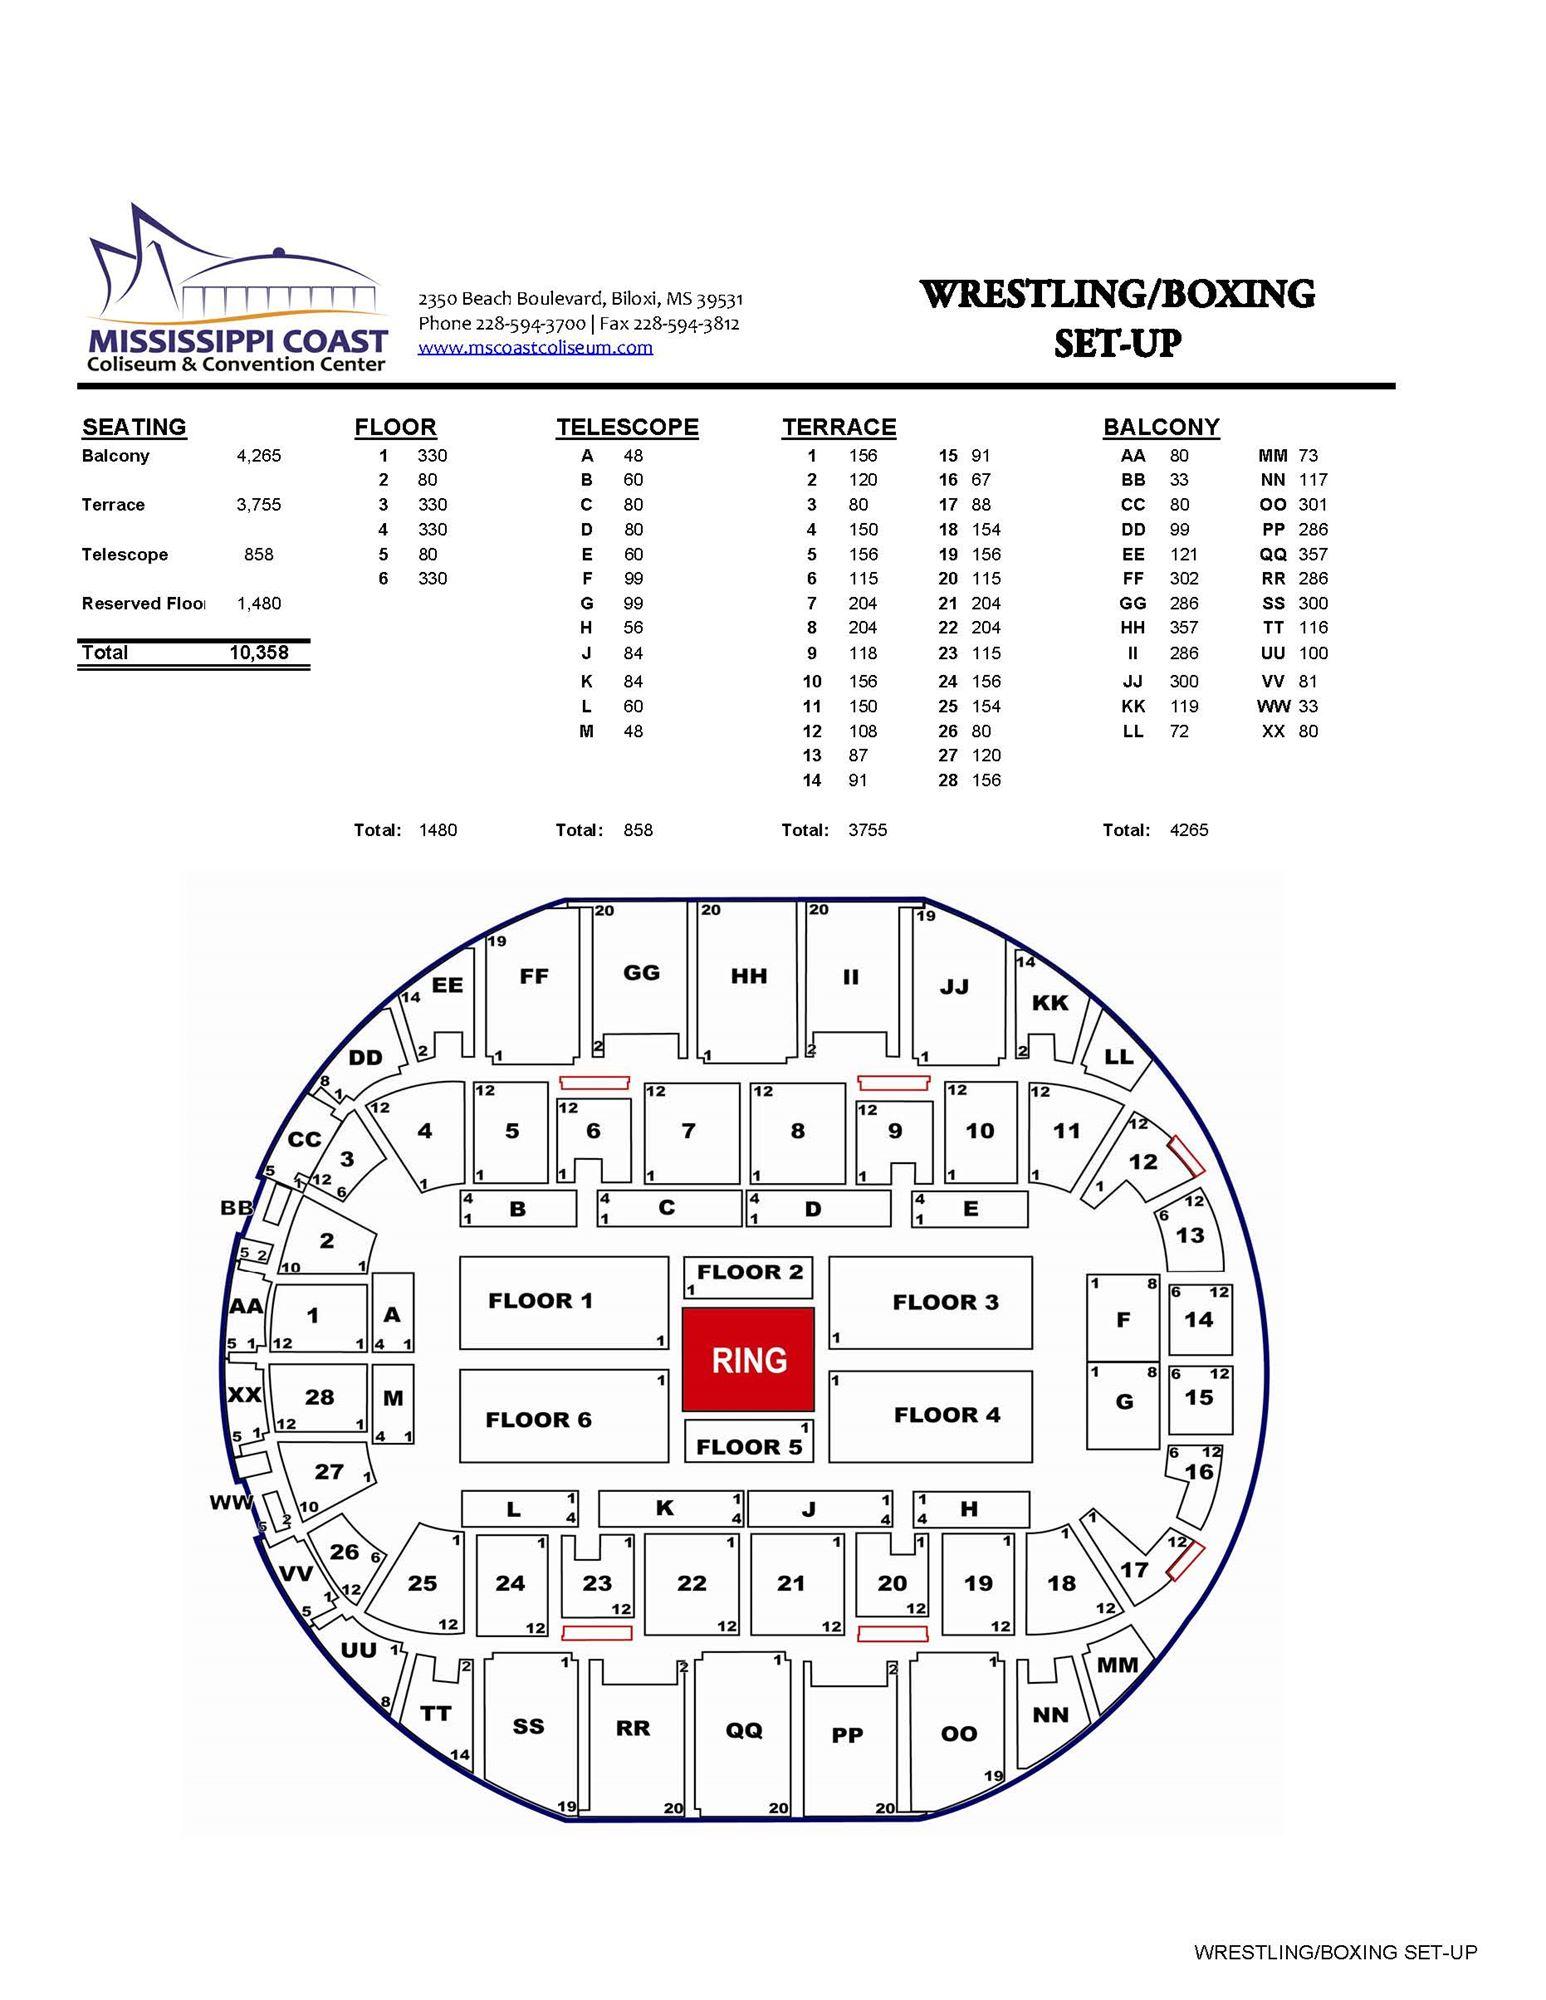 Arena Seating Capacities